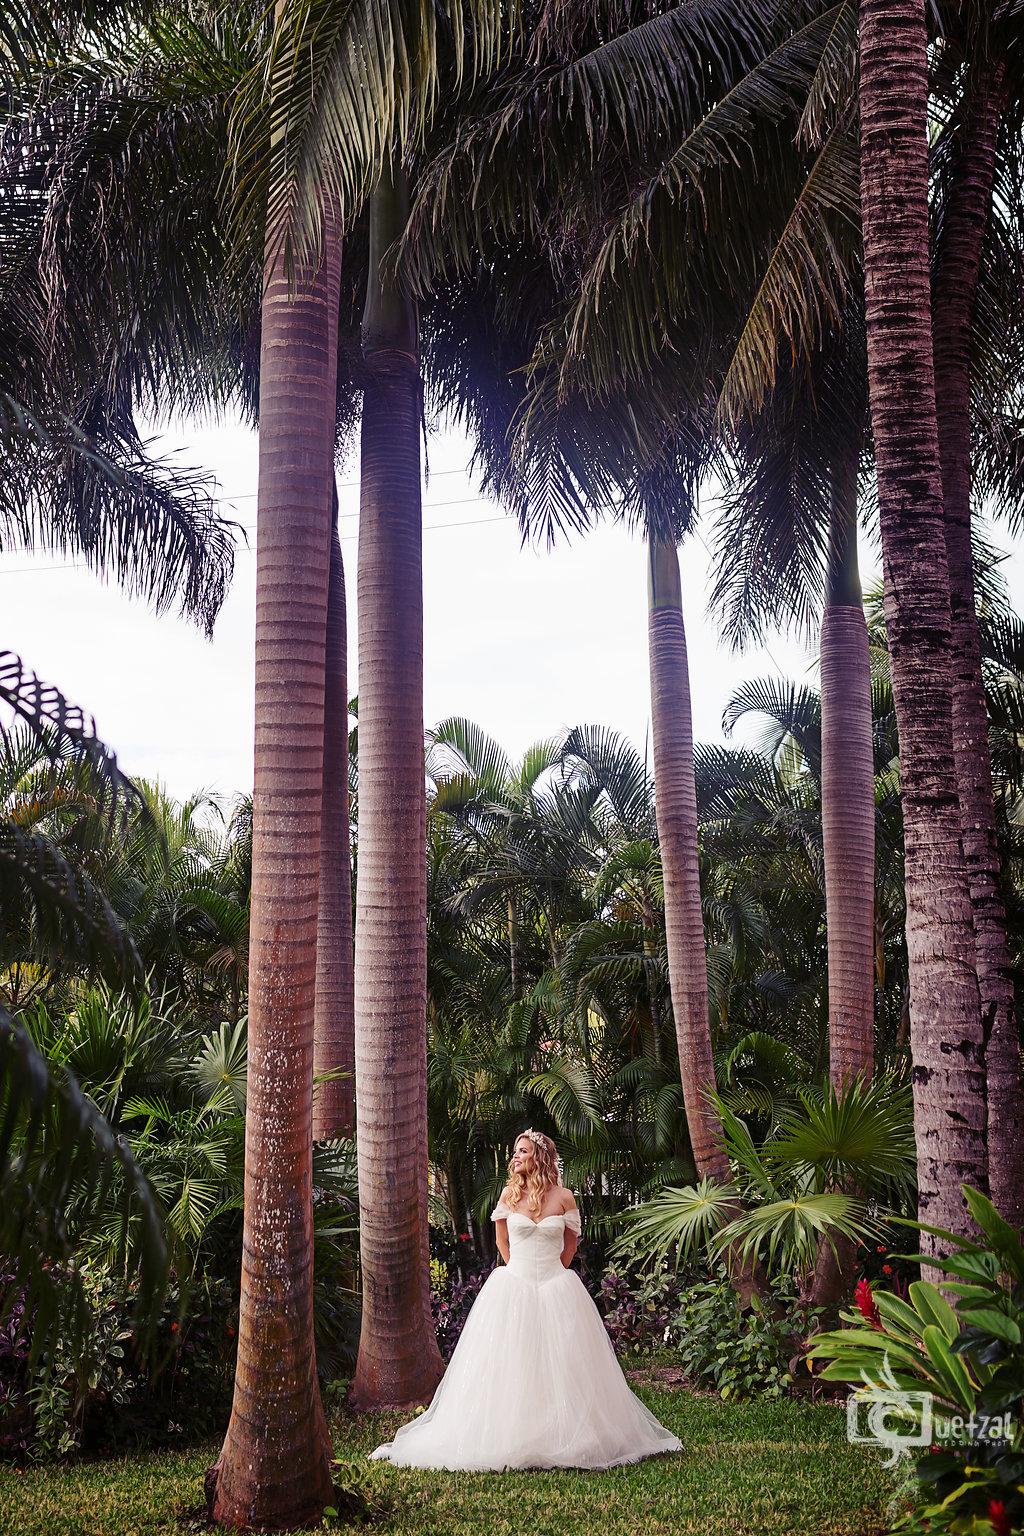 cancun-mexico-destination-wedding-villa-la-joya-12.jpg